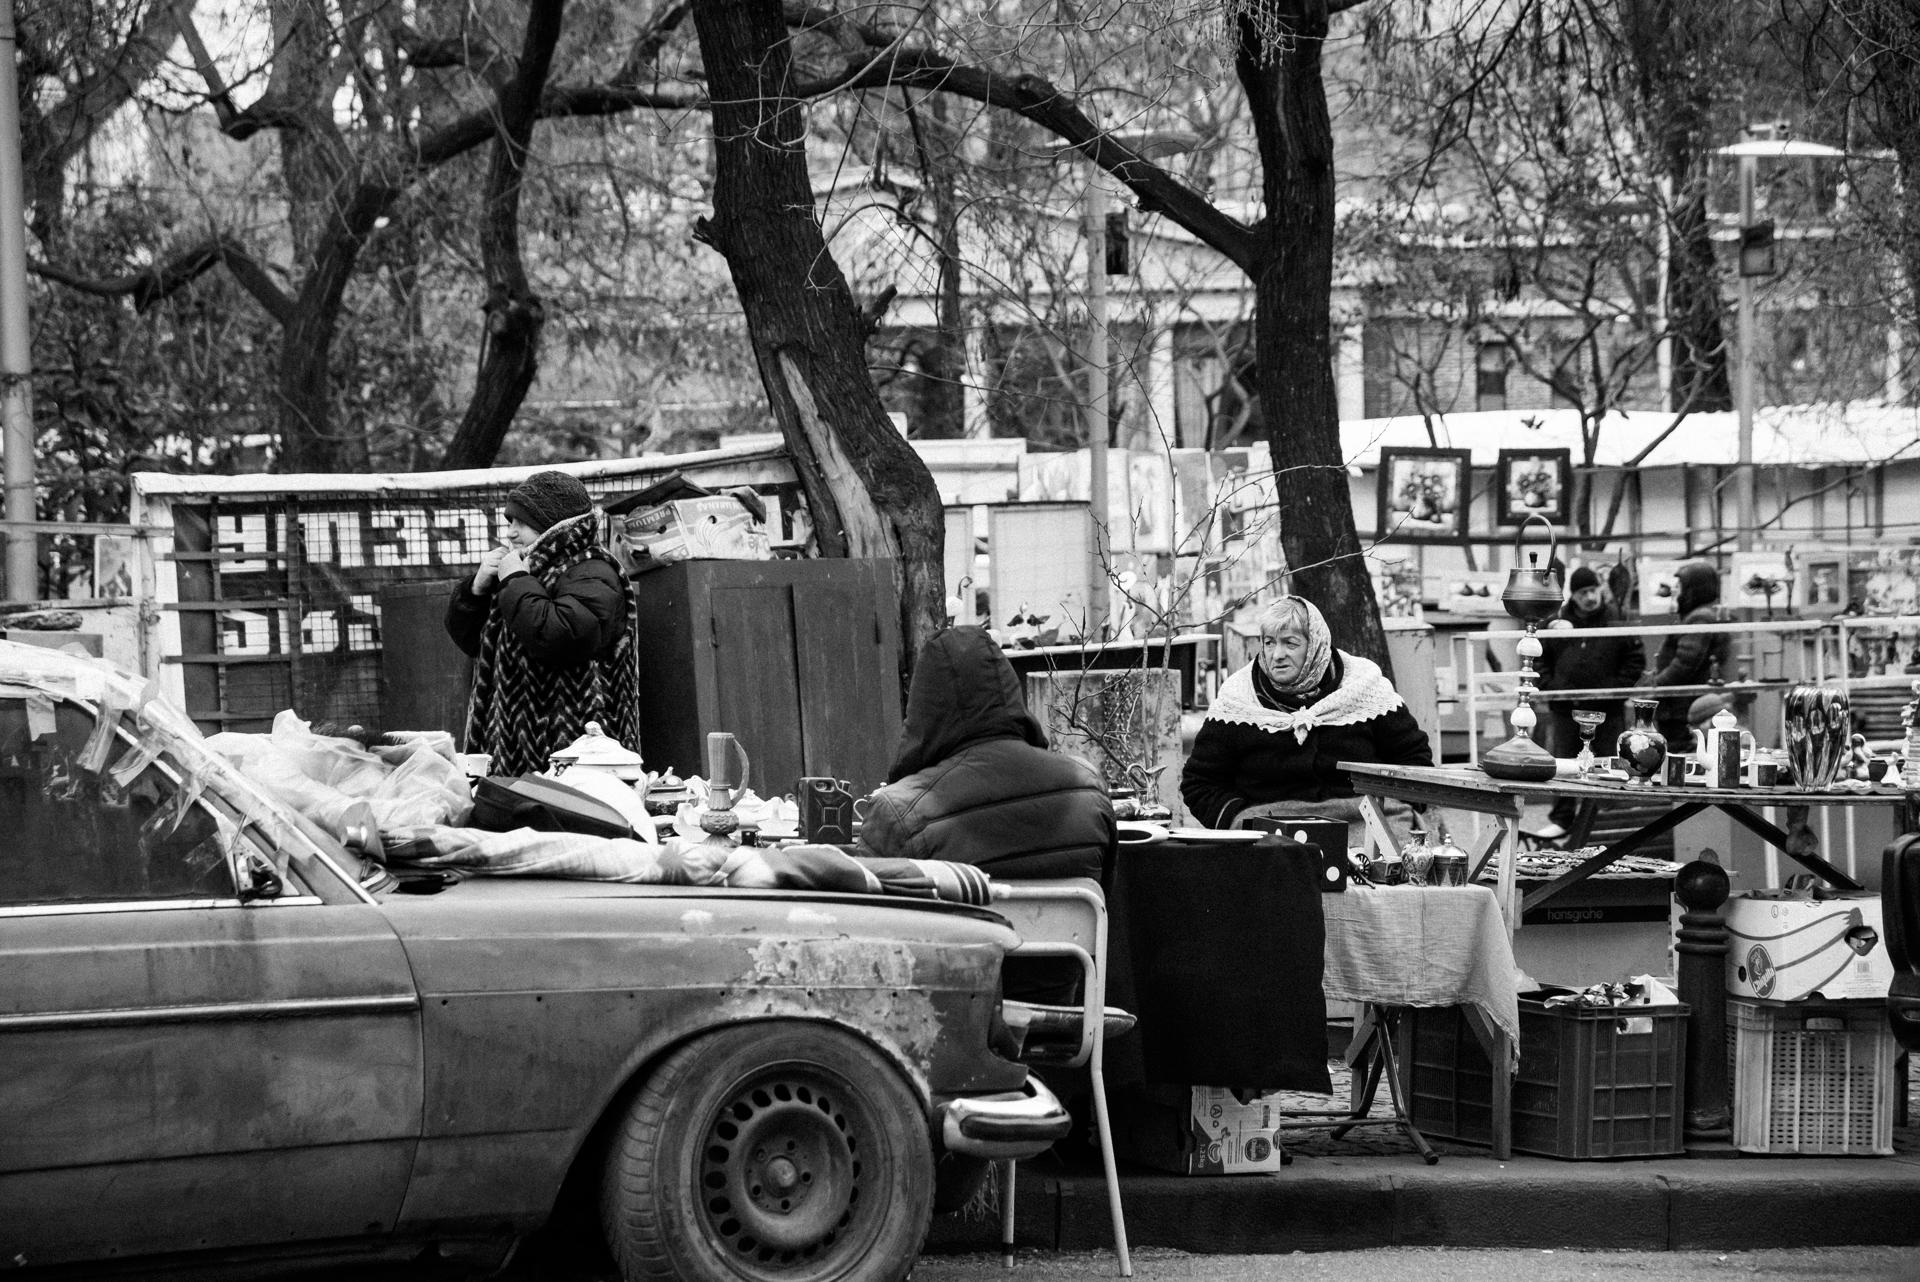 tbilisi-georgia-black-and-white-photography (8).jpg